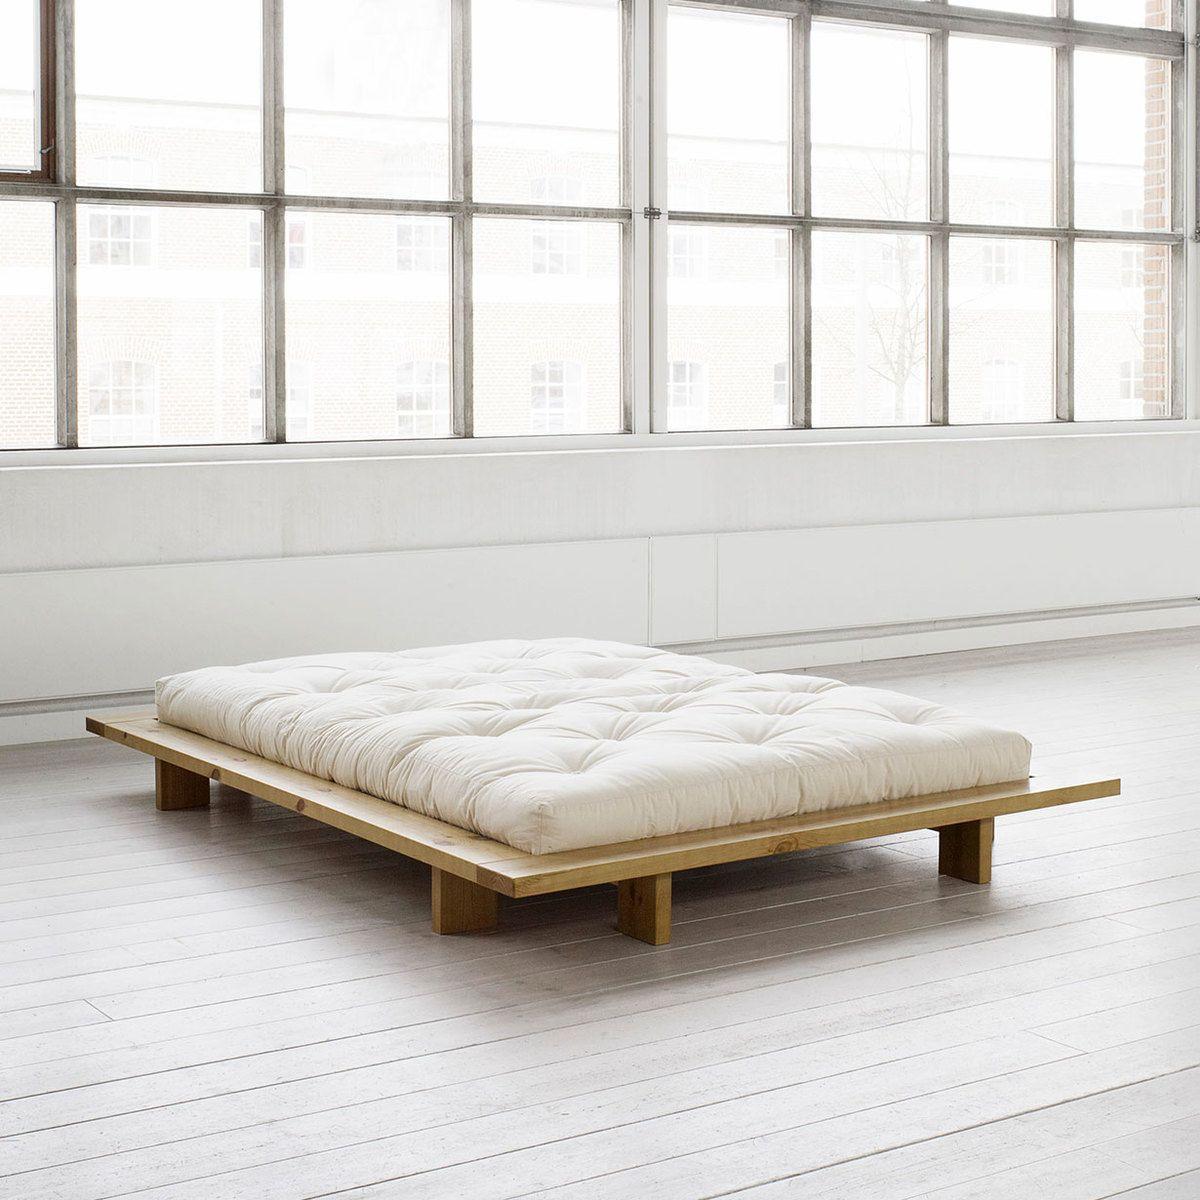 Letto Matrimoniale Futon.Letto Matrimoniale Japan L 168 Cm Miele Minimalist Bed Futon